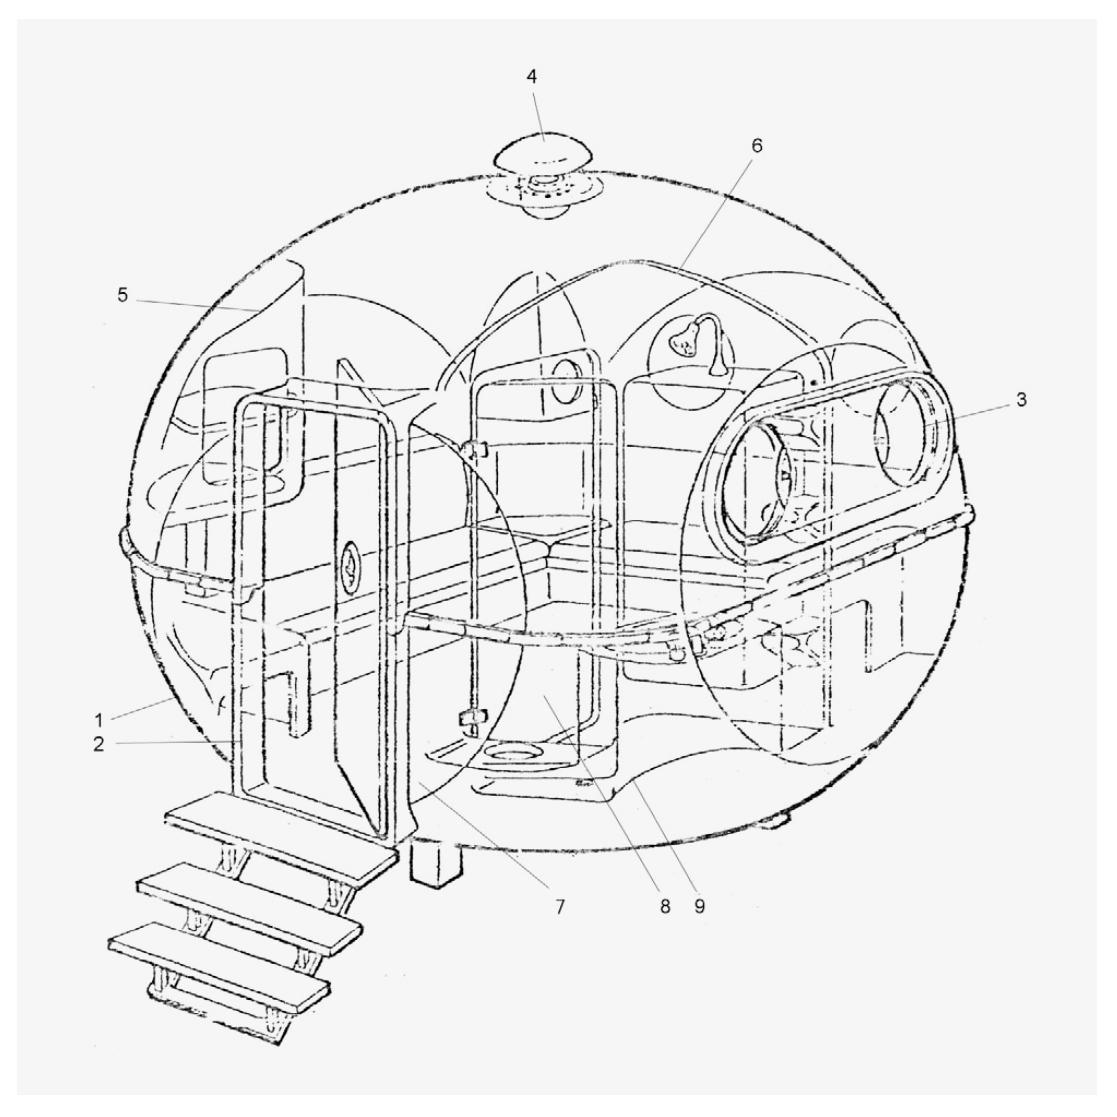 'BANGA' Modular Space Age Architecture, Carlo Zappa Bungalow Int, 1971, Italy